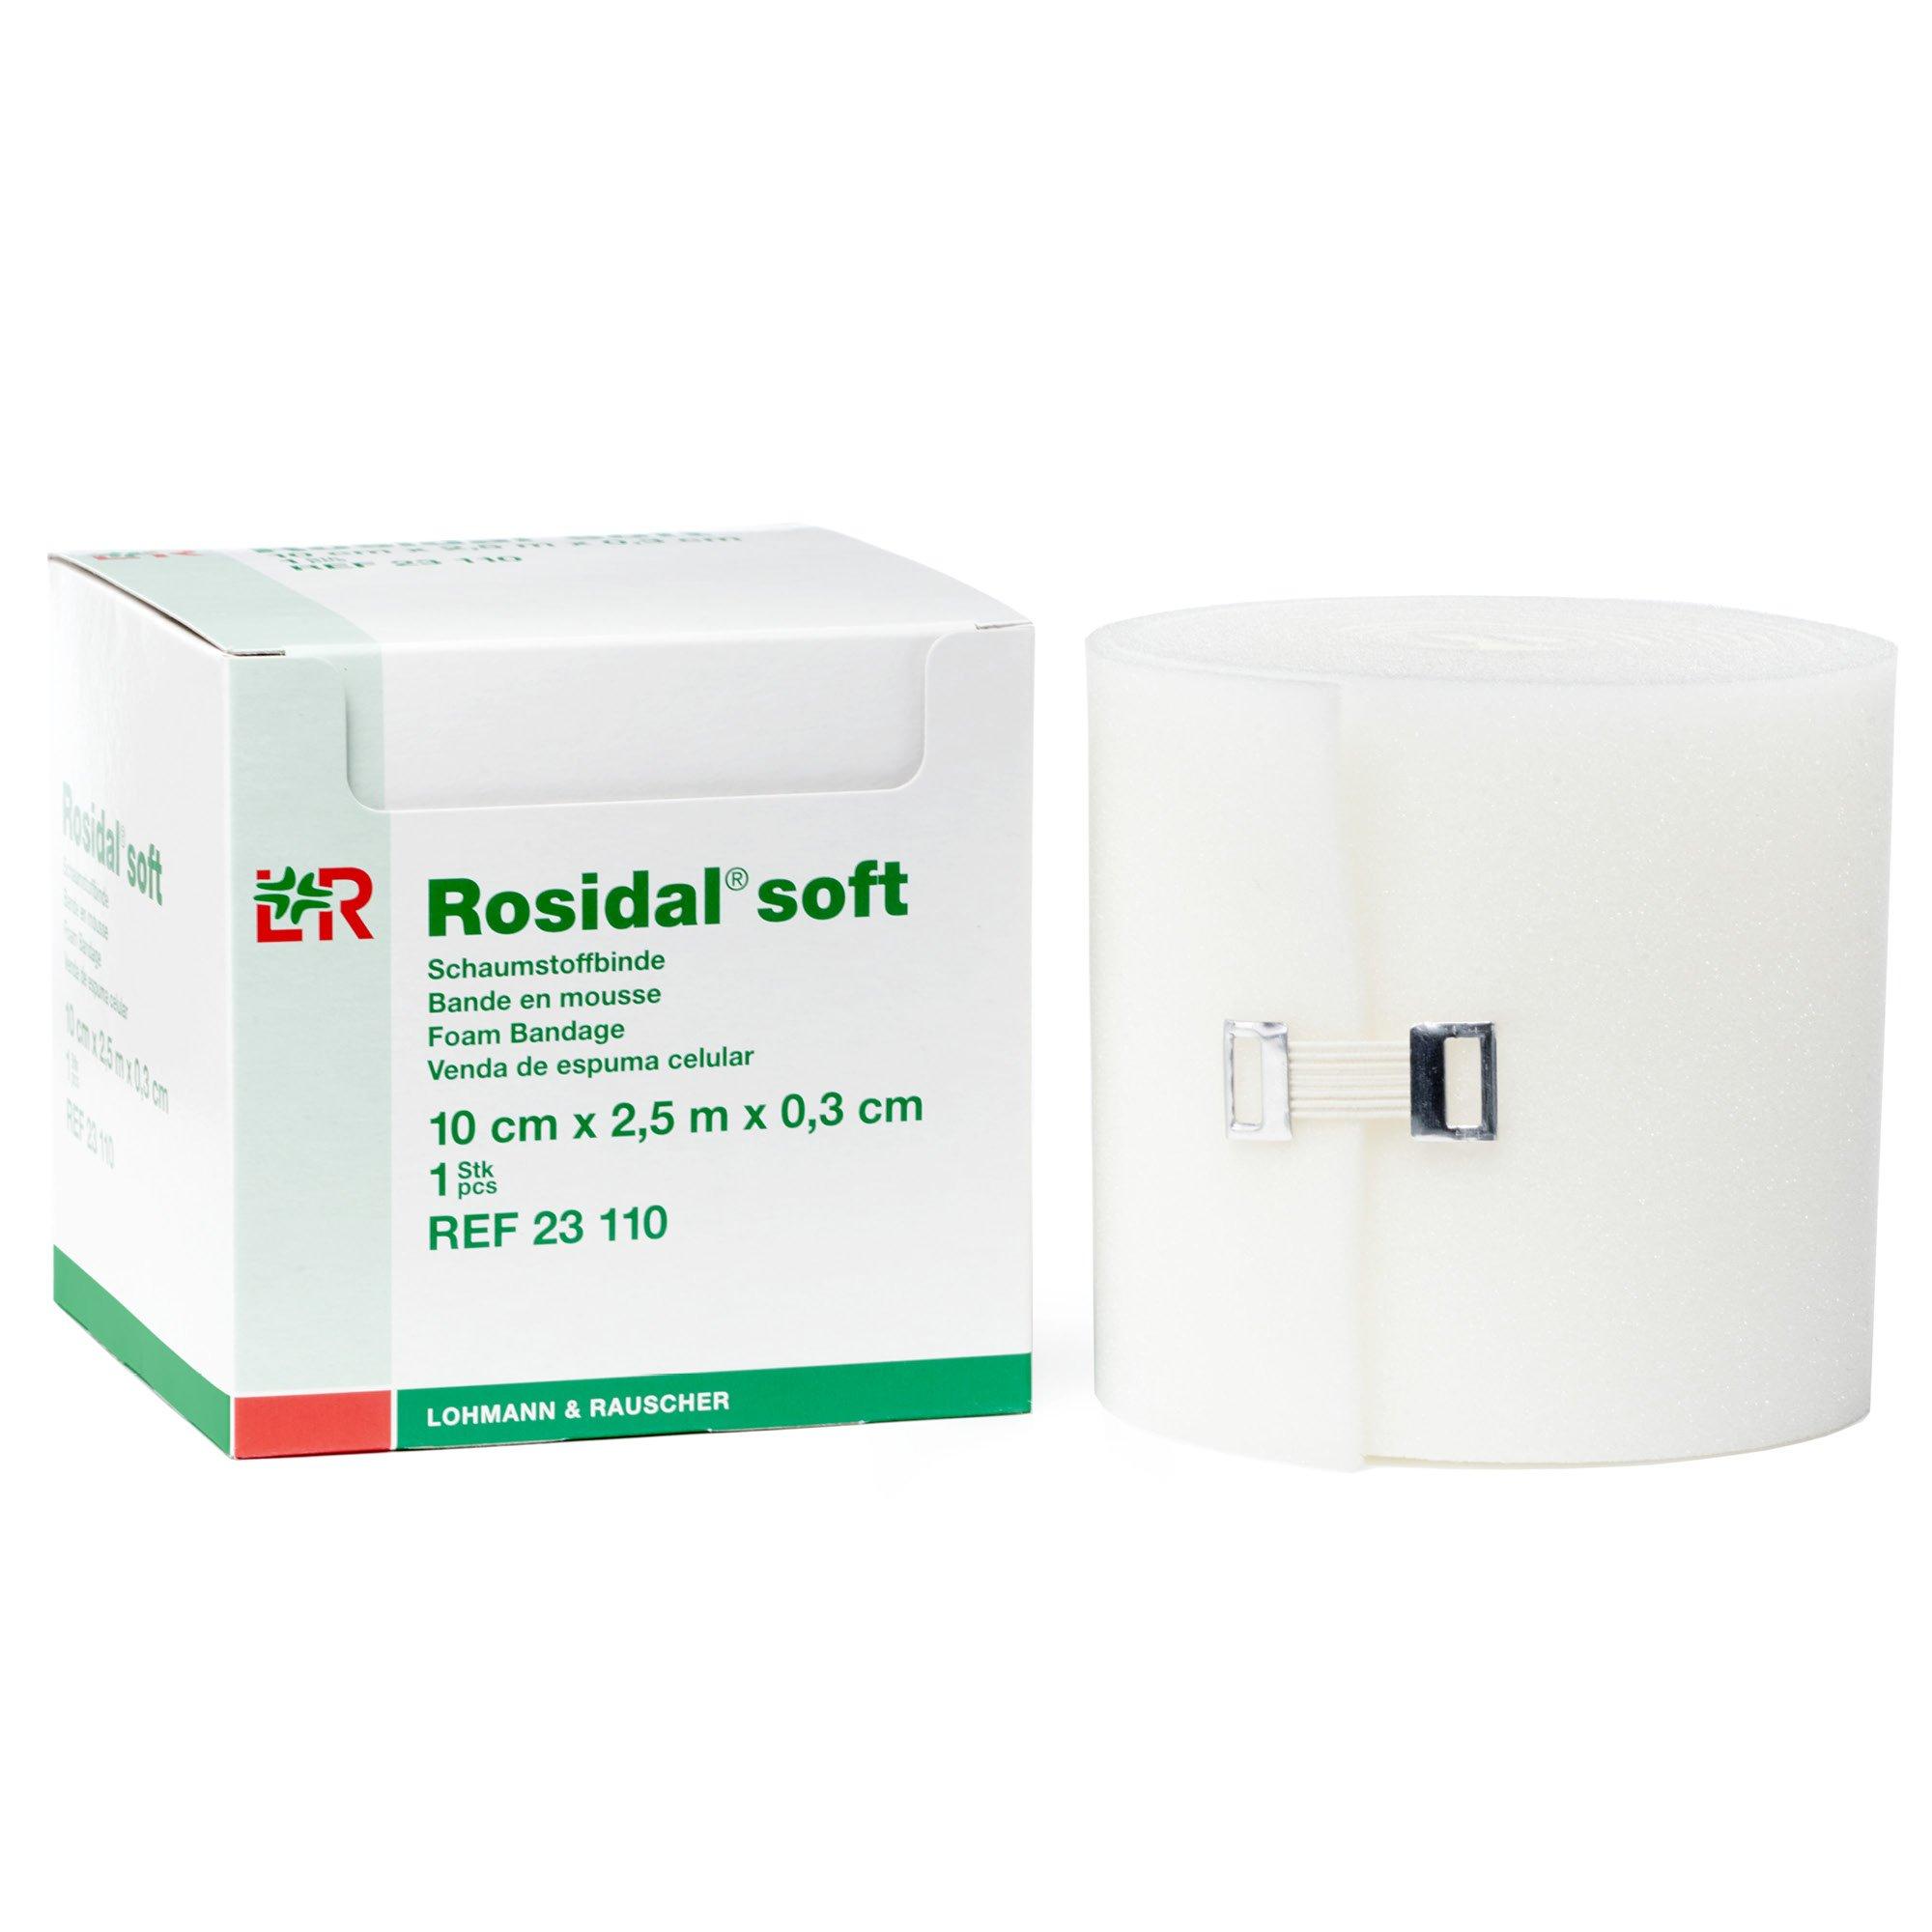 Rosidal Soft Foam Padding, Foam Dressing & Lymphedema Padding for Compression Distribution, 10 cm x .3 cm x 2.5 m, Case of 30 Rolls